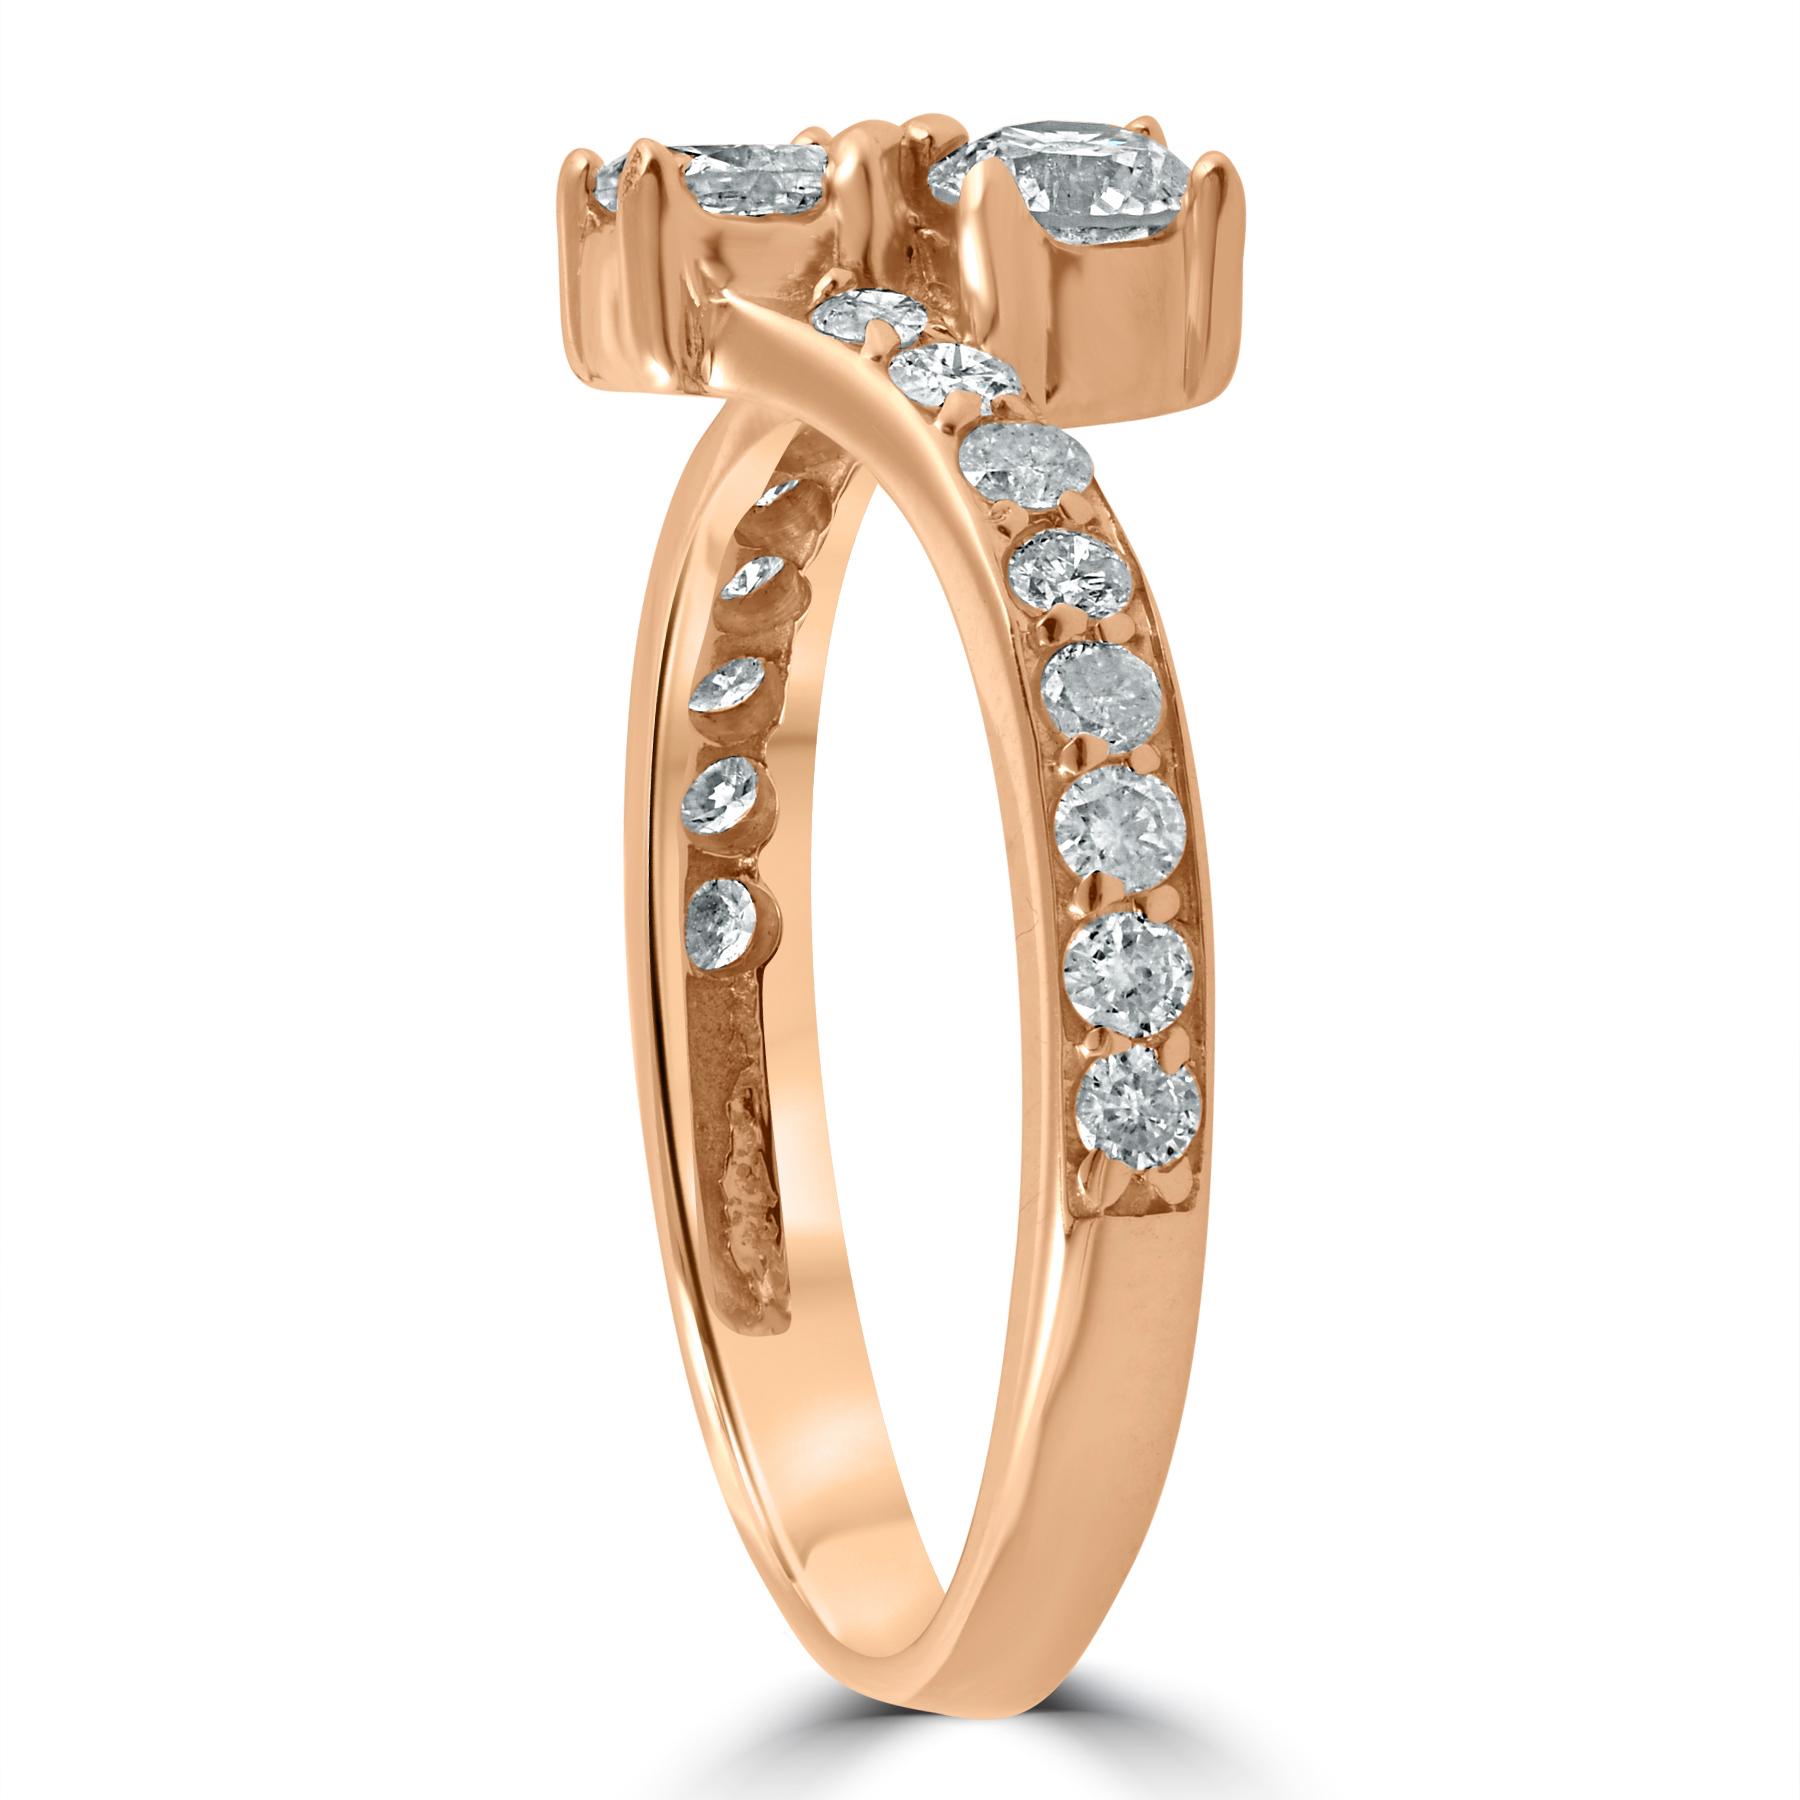 1 carat forever us 2 stone solitiare diamond engagement. Black Bedroom Furniture Sets. Home Design Ideas